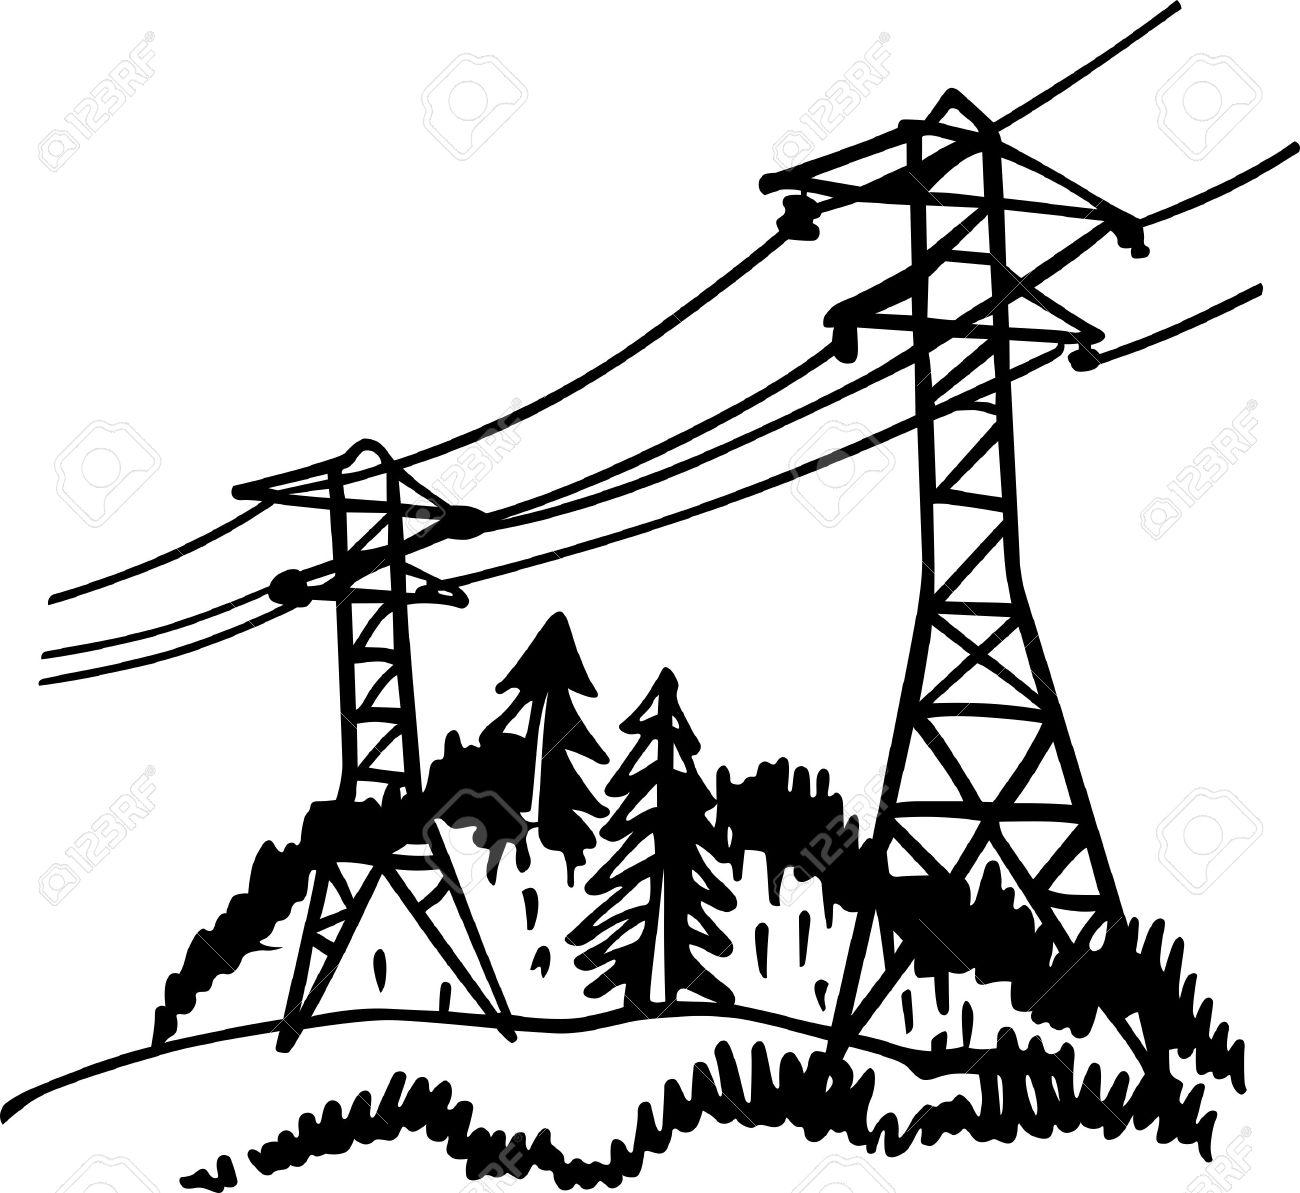 Power Lines Drawing At Getdrawings